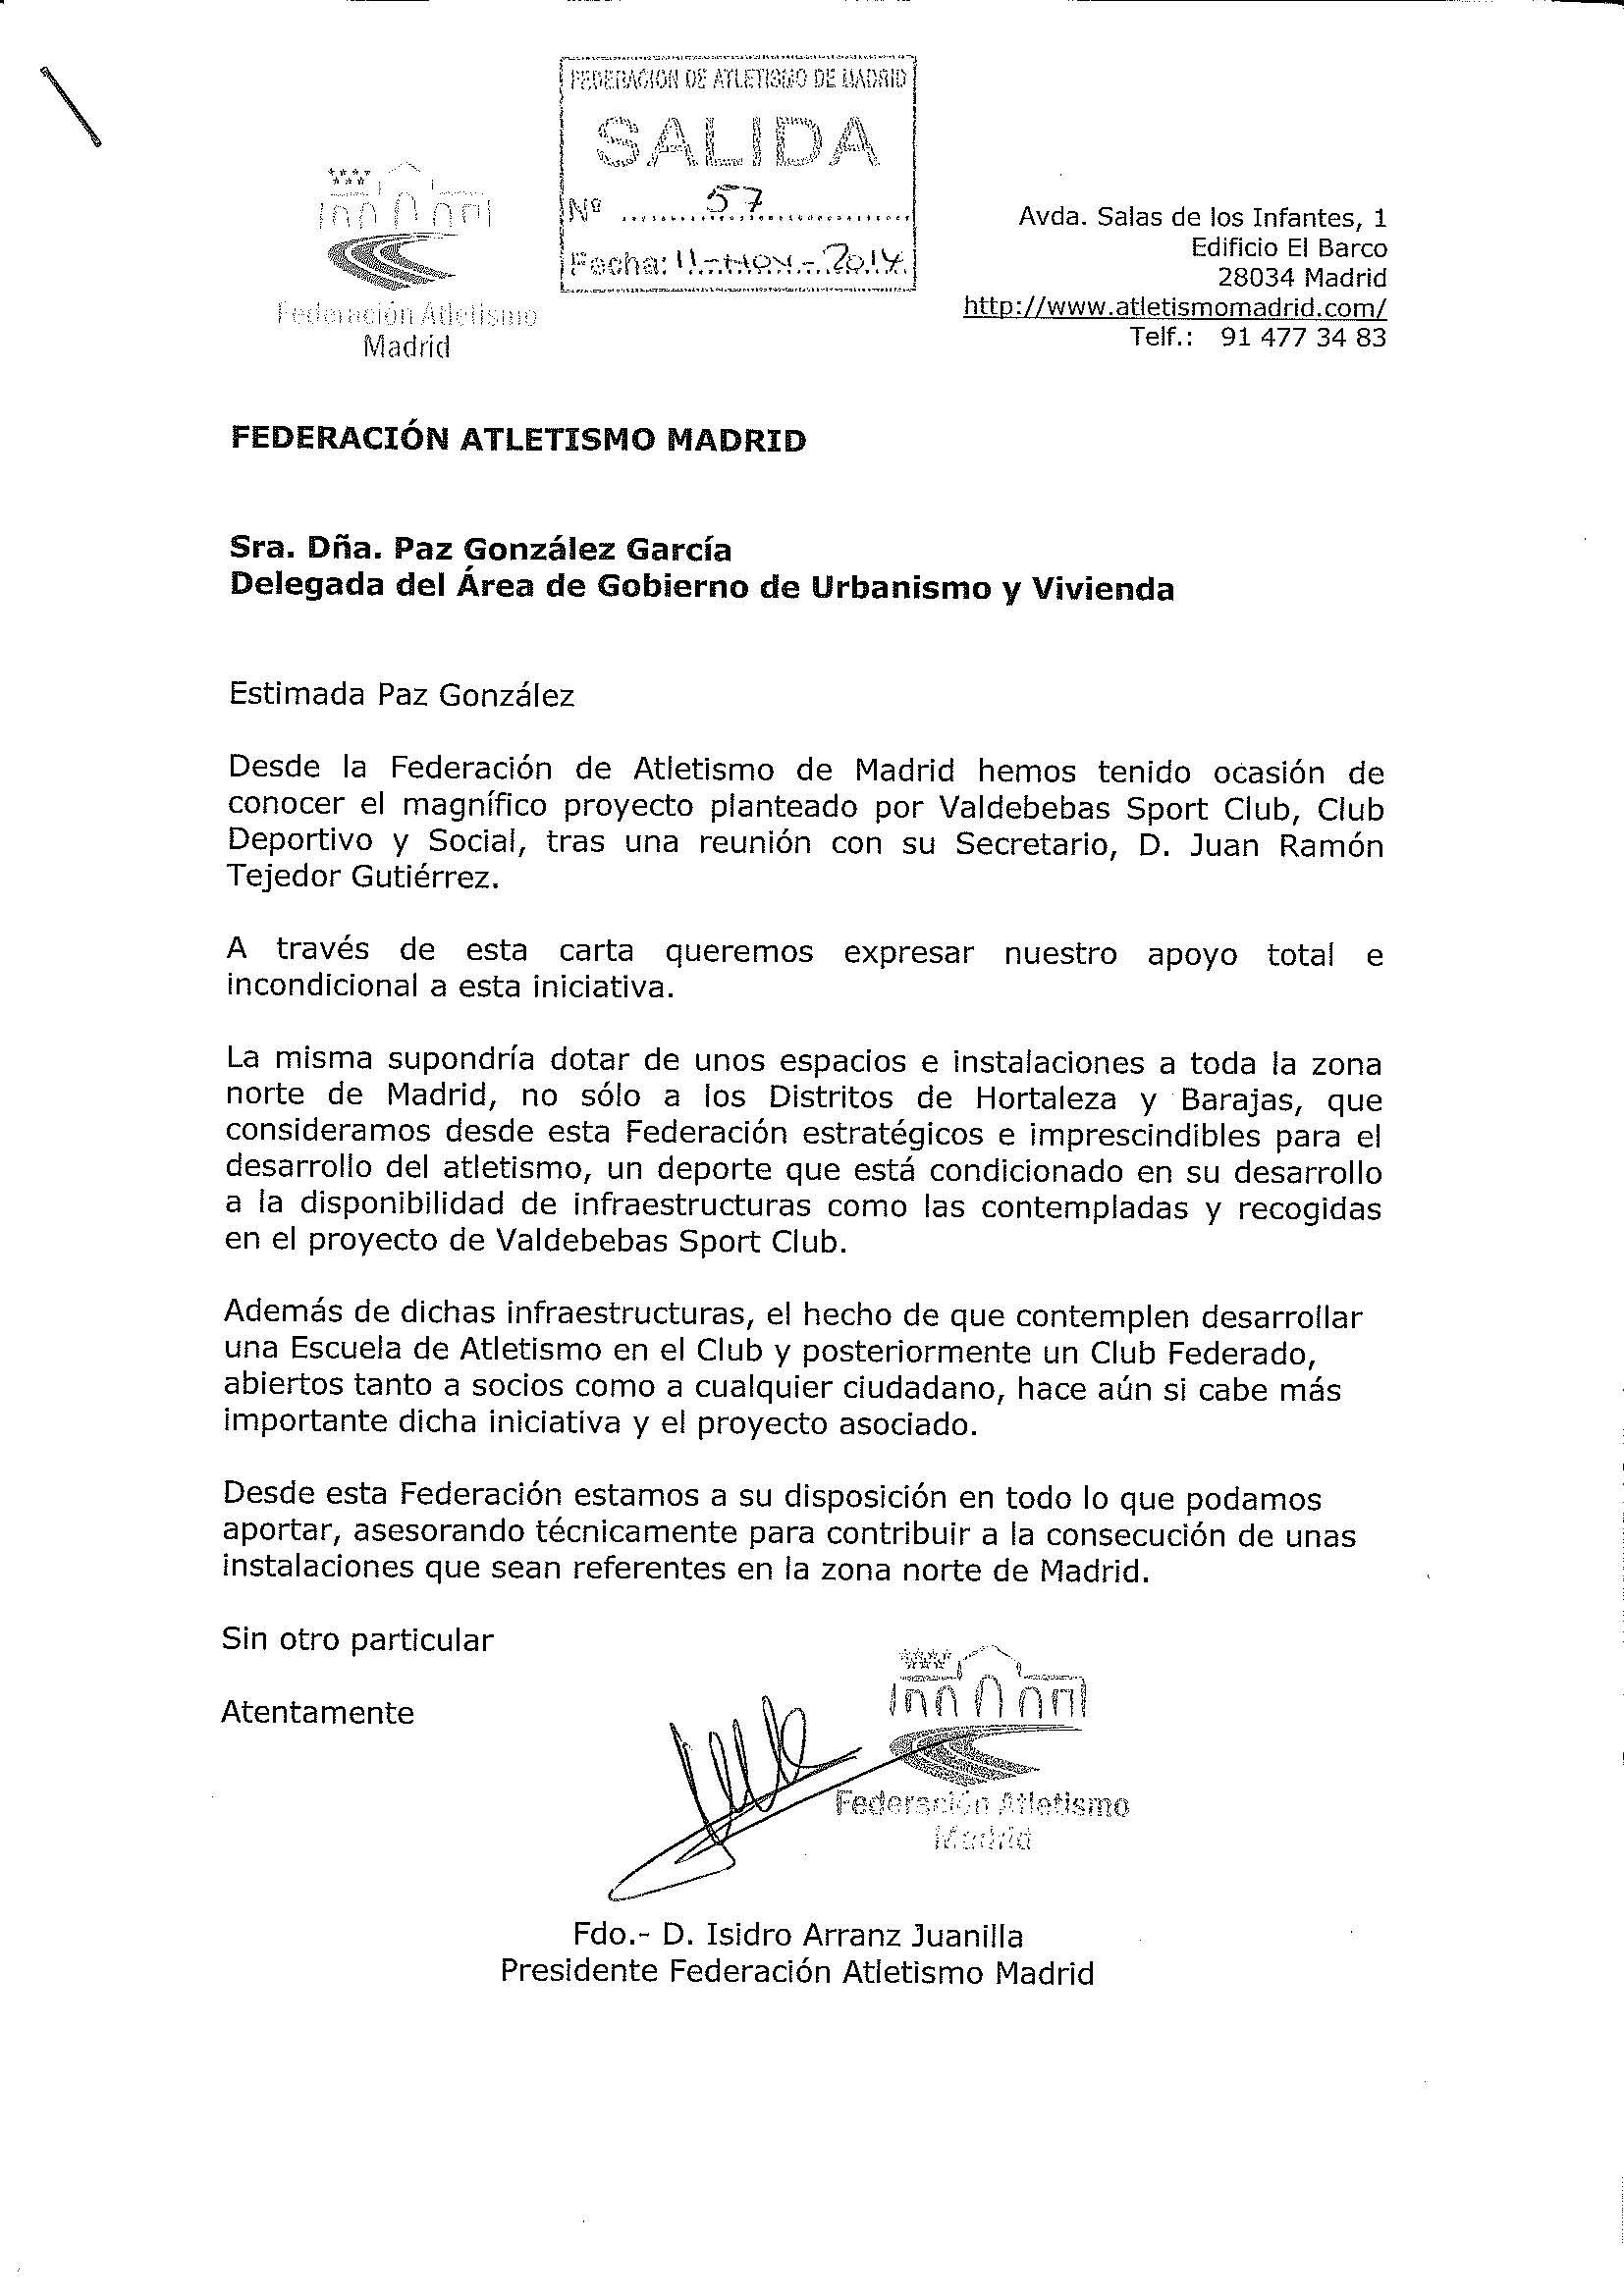 carta-apoyo-vsc-federacion-atletismo-madrid